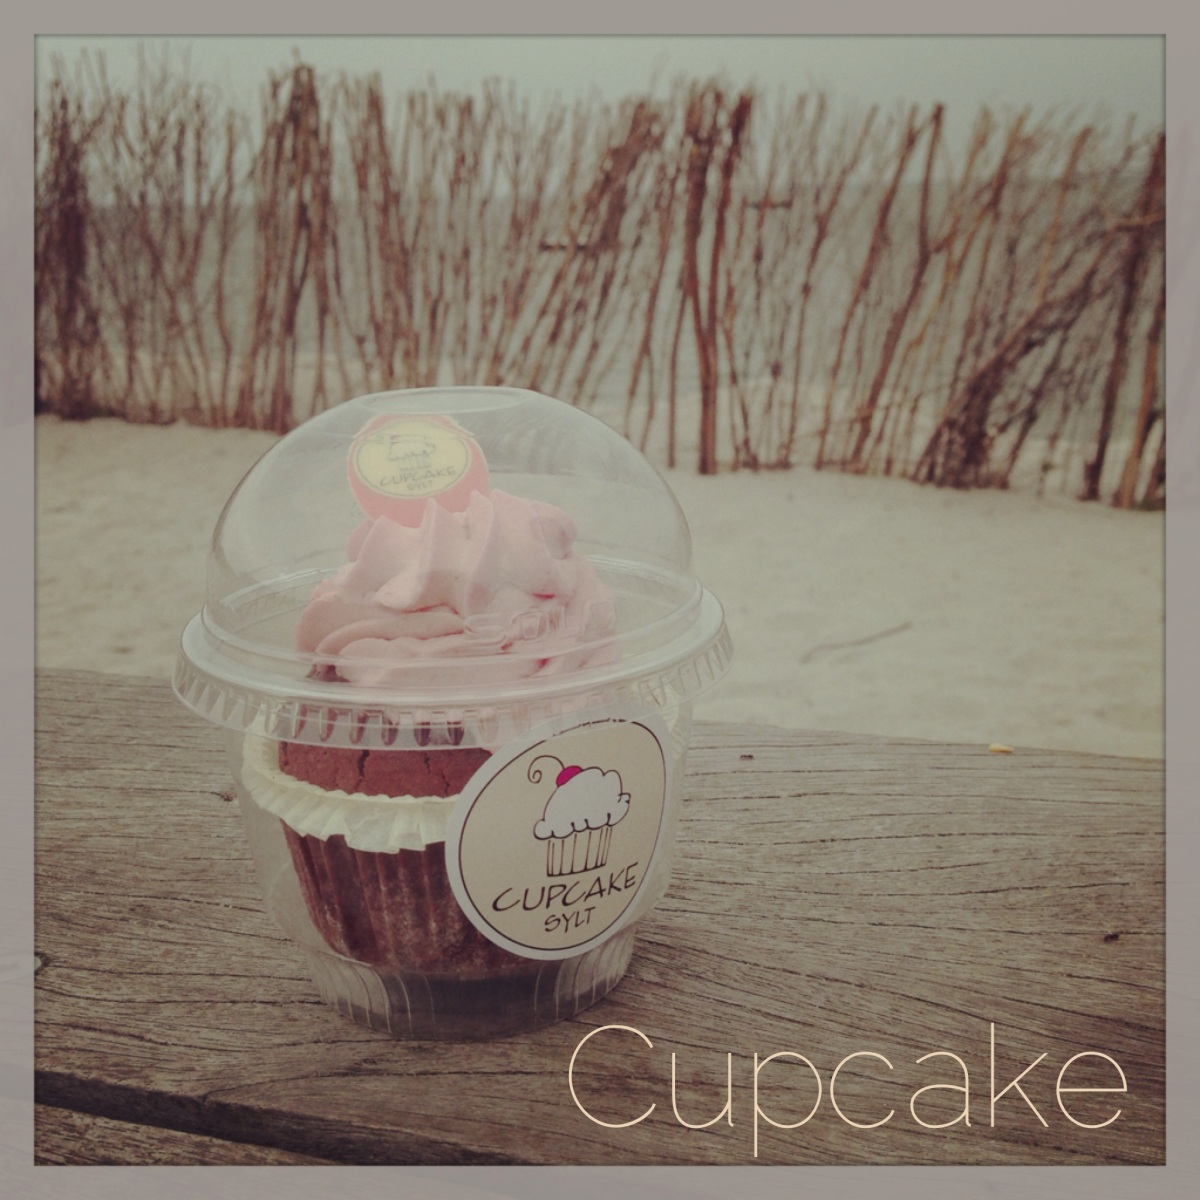 Cupcake Sylt